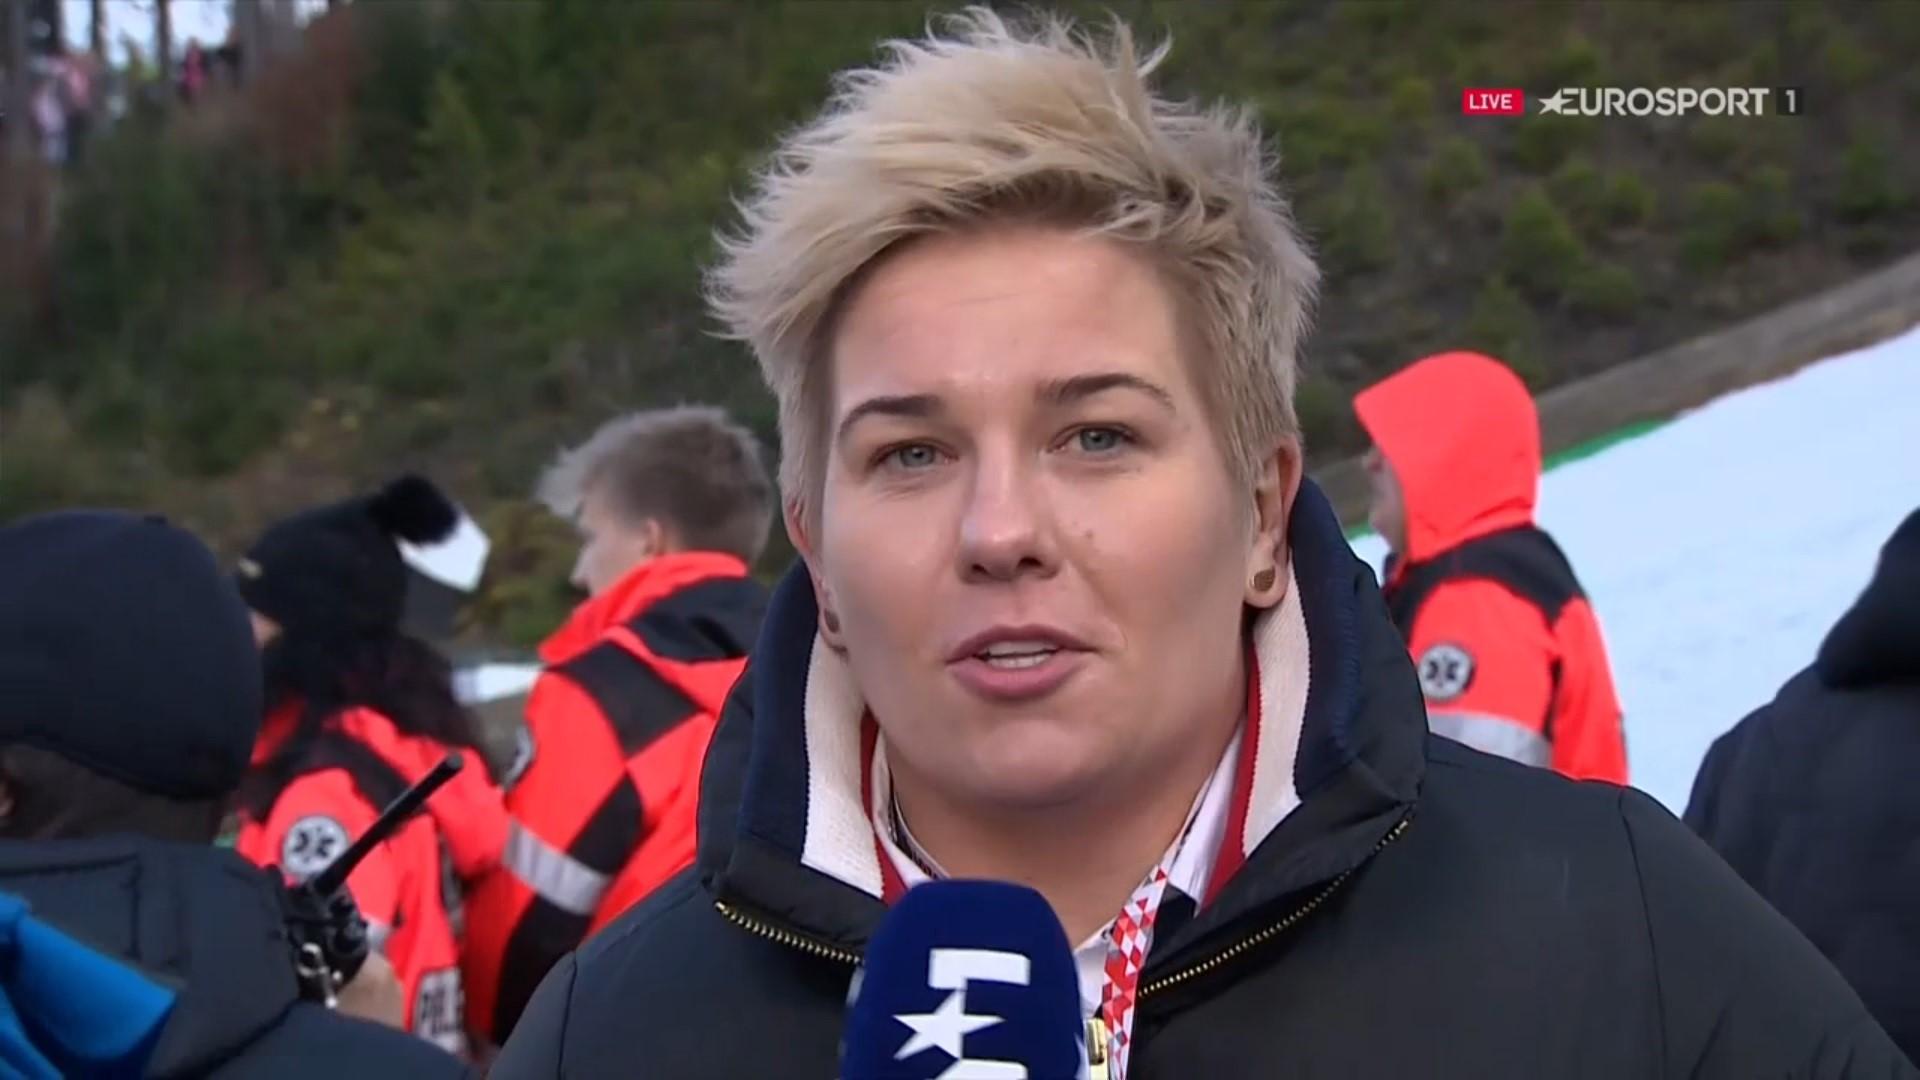 https://i.eurosport.com/2019/11/23/2722684.jpg